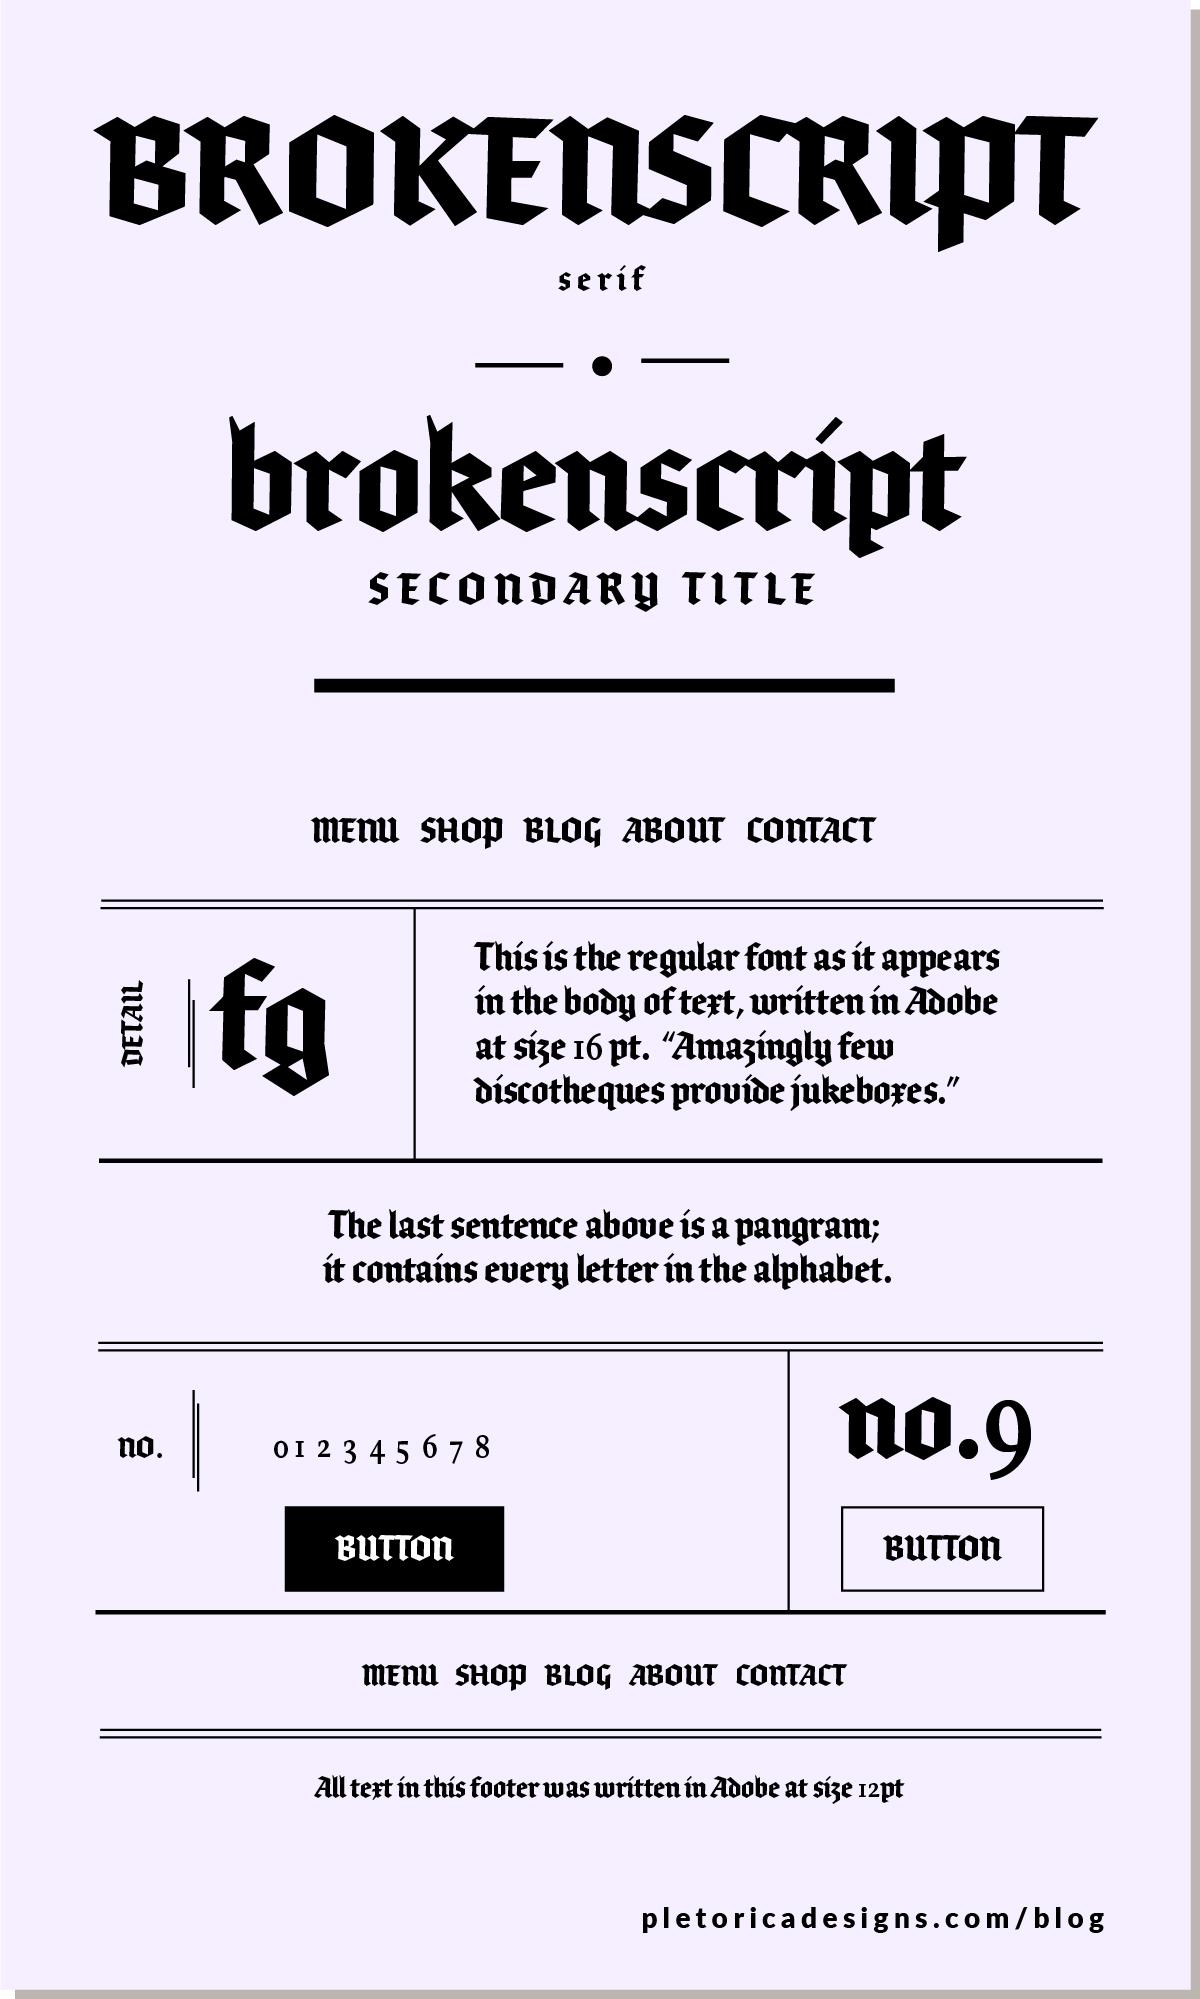 LET'S TYPE: Brokenscript — PLETÓRICA DESIGNS